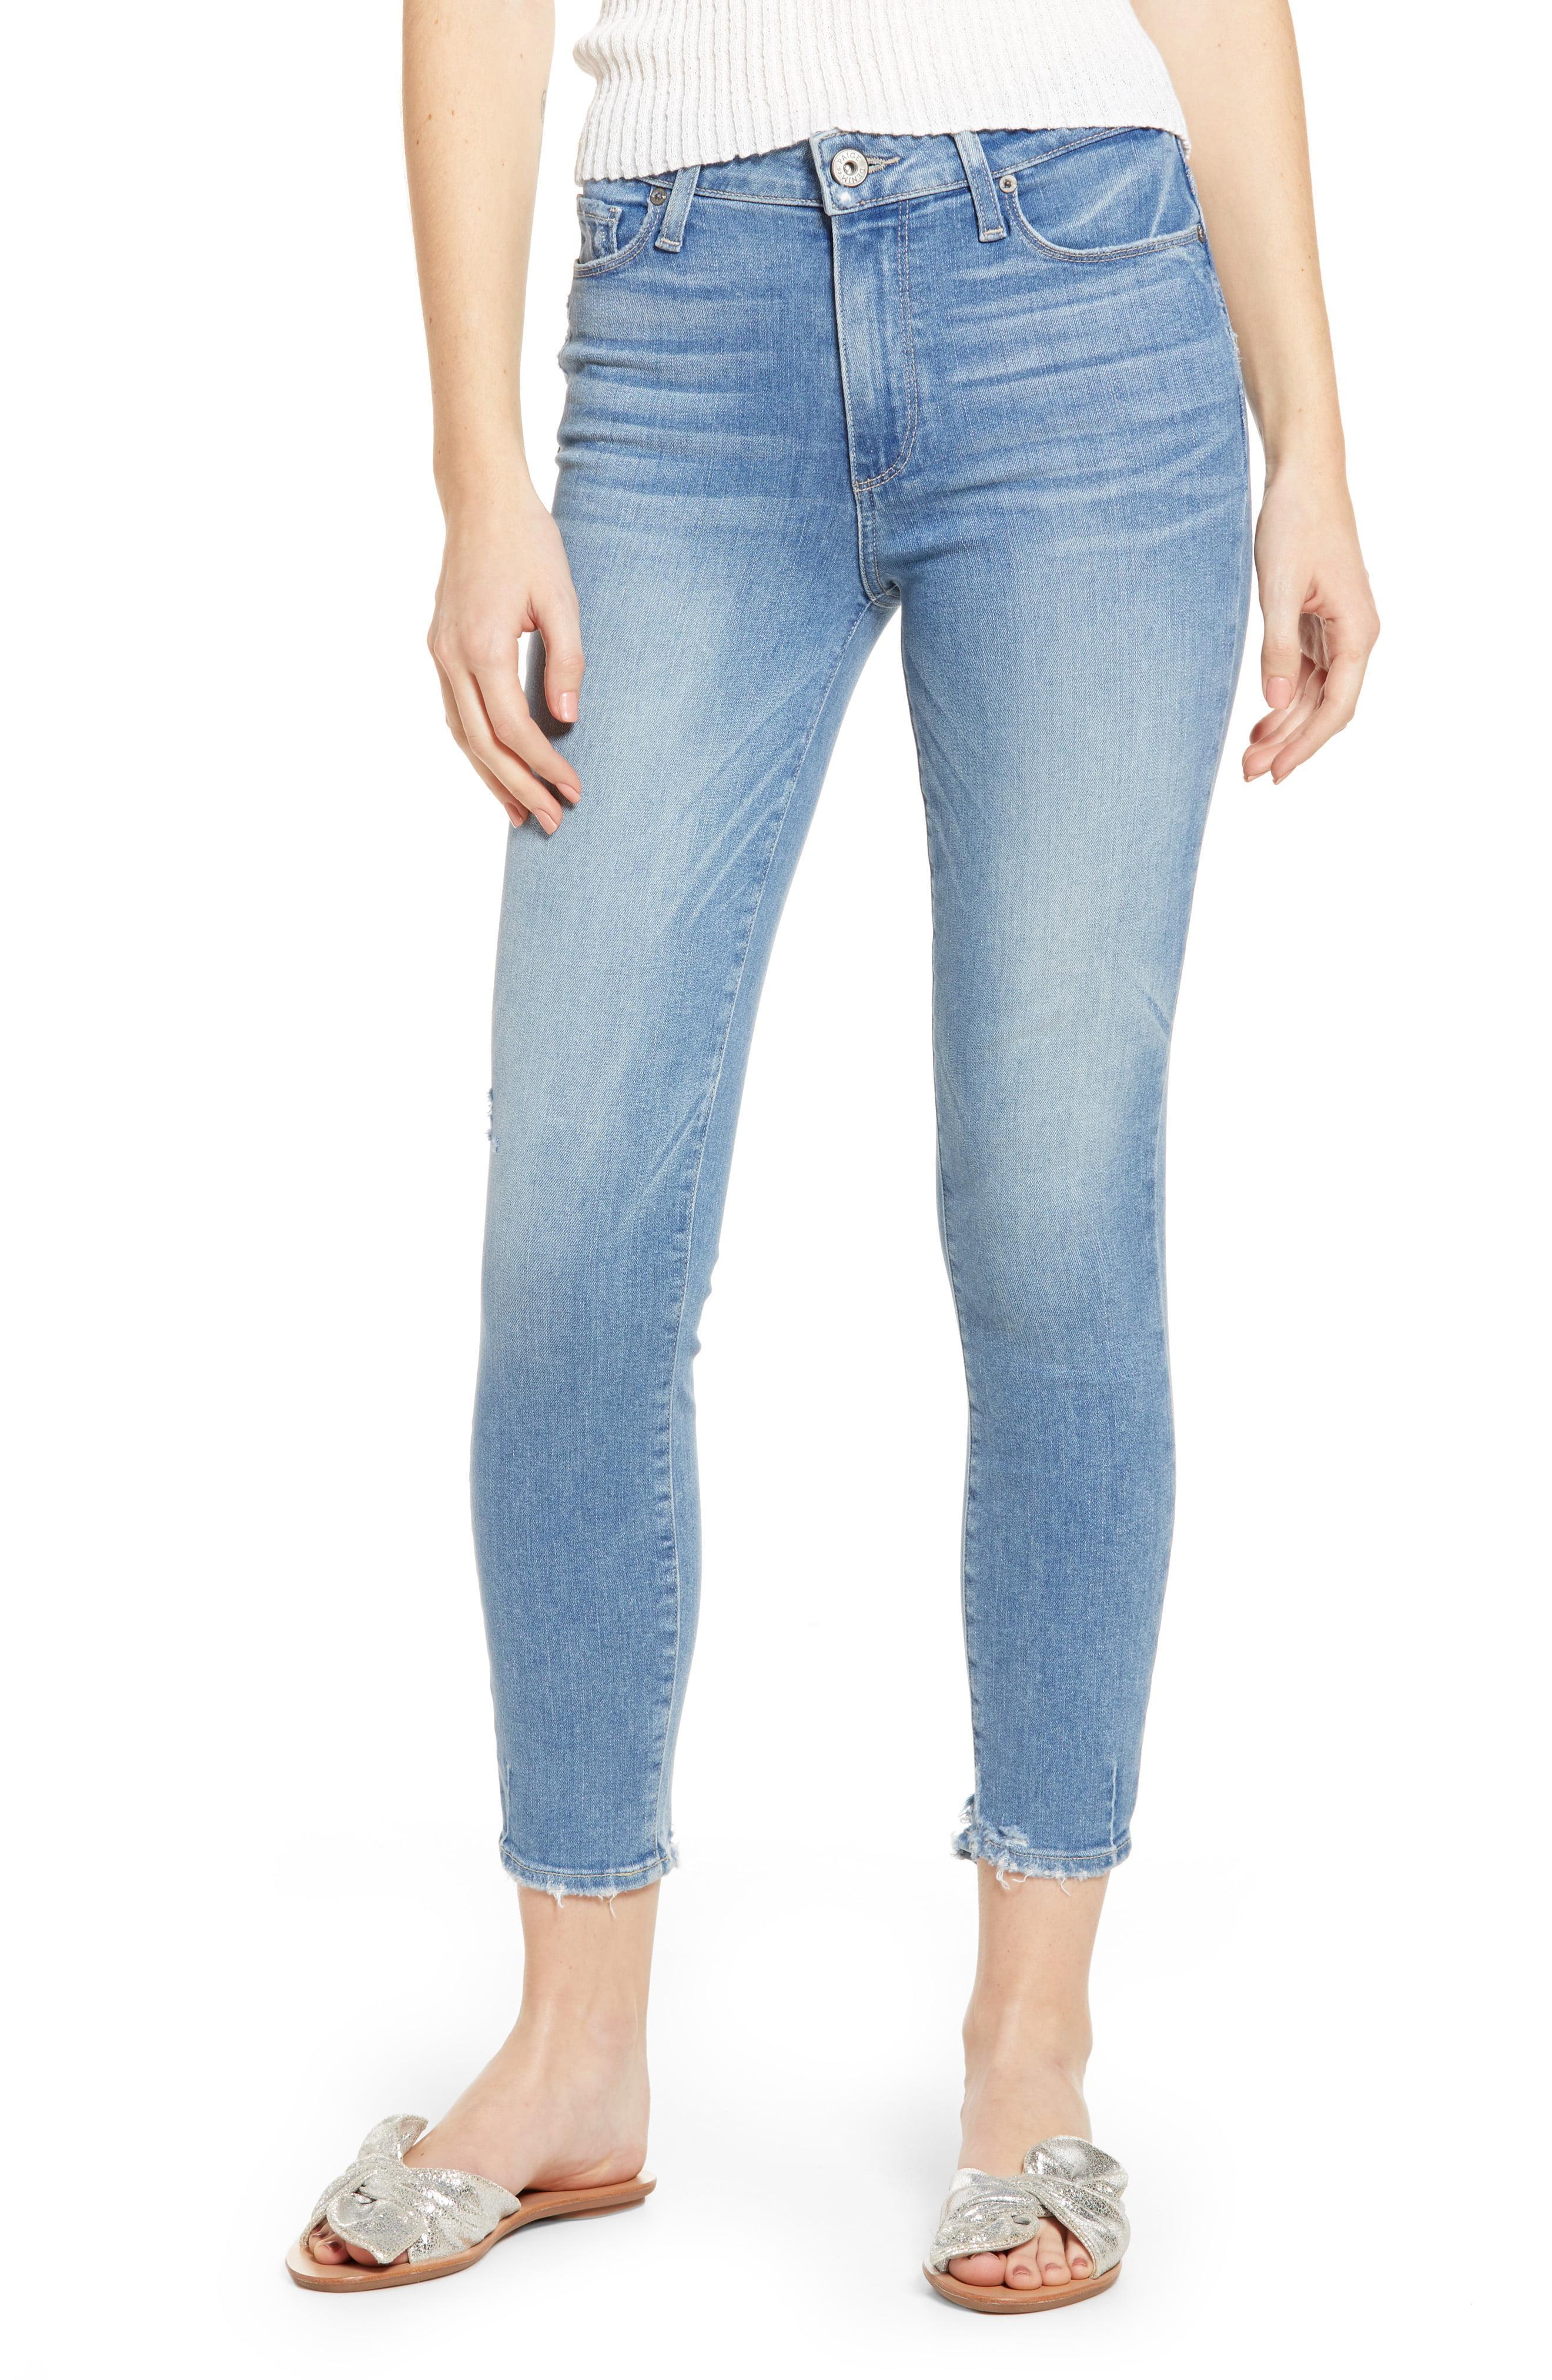 9a2dca7f5ef36 PAIGE. Women s Blue Hoxton Transcend Vintage High Waist Crop Skinny Jeans